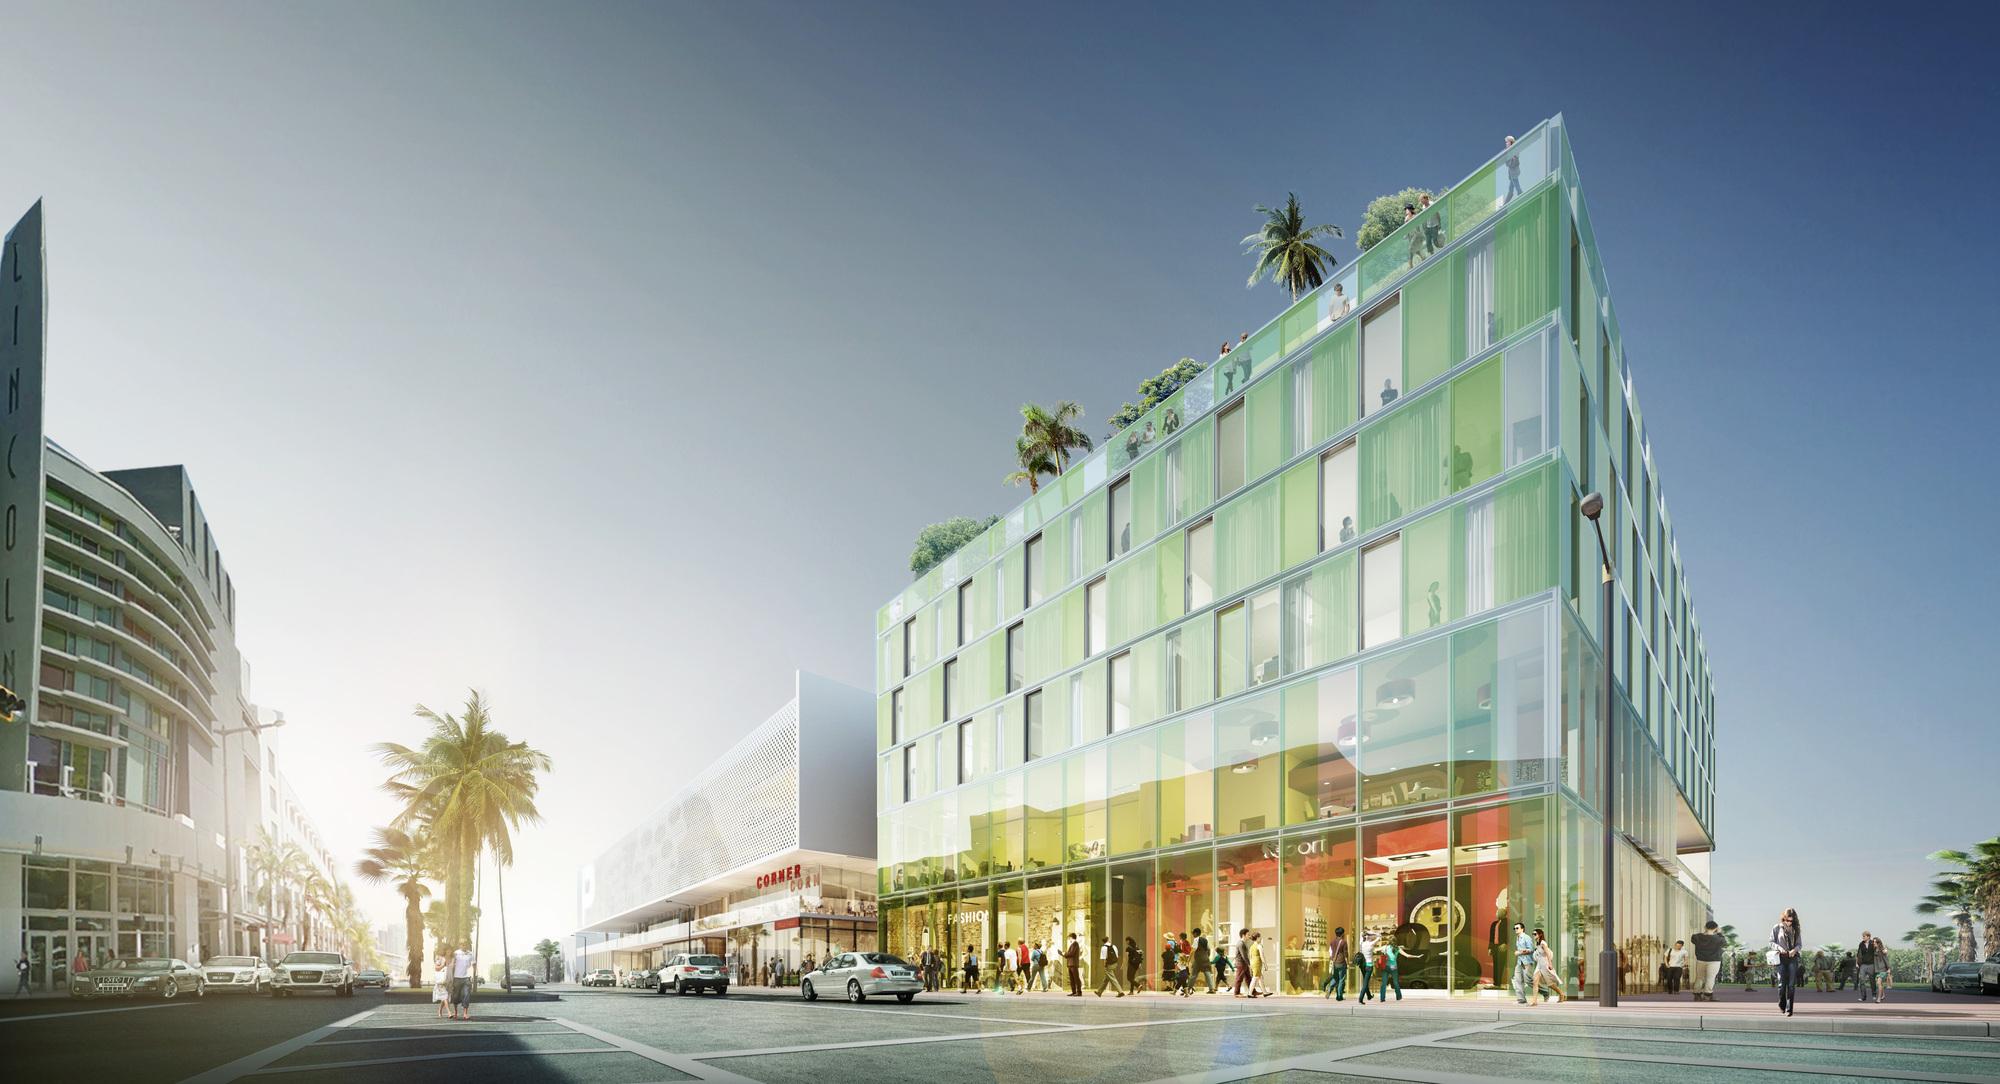 perkins+will designs miami beach 'glass prism' | archdaily